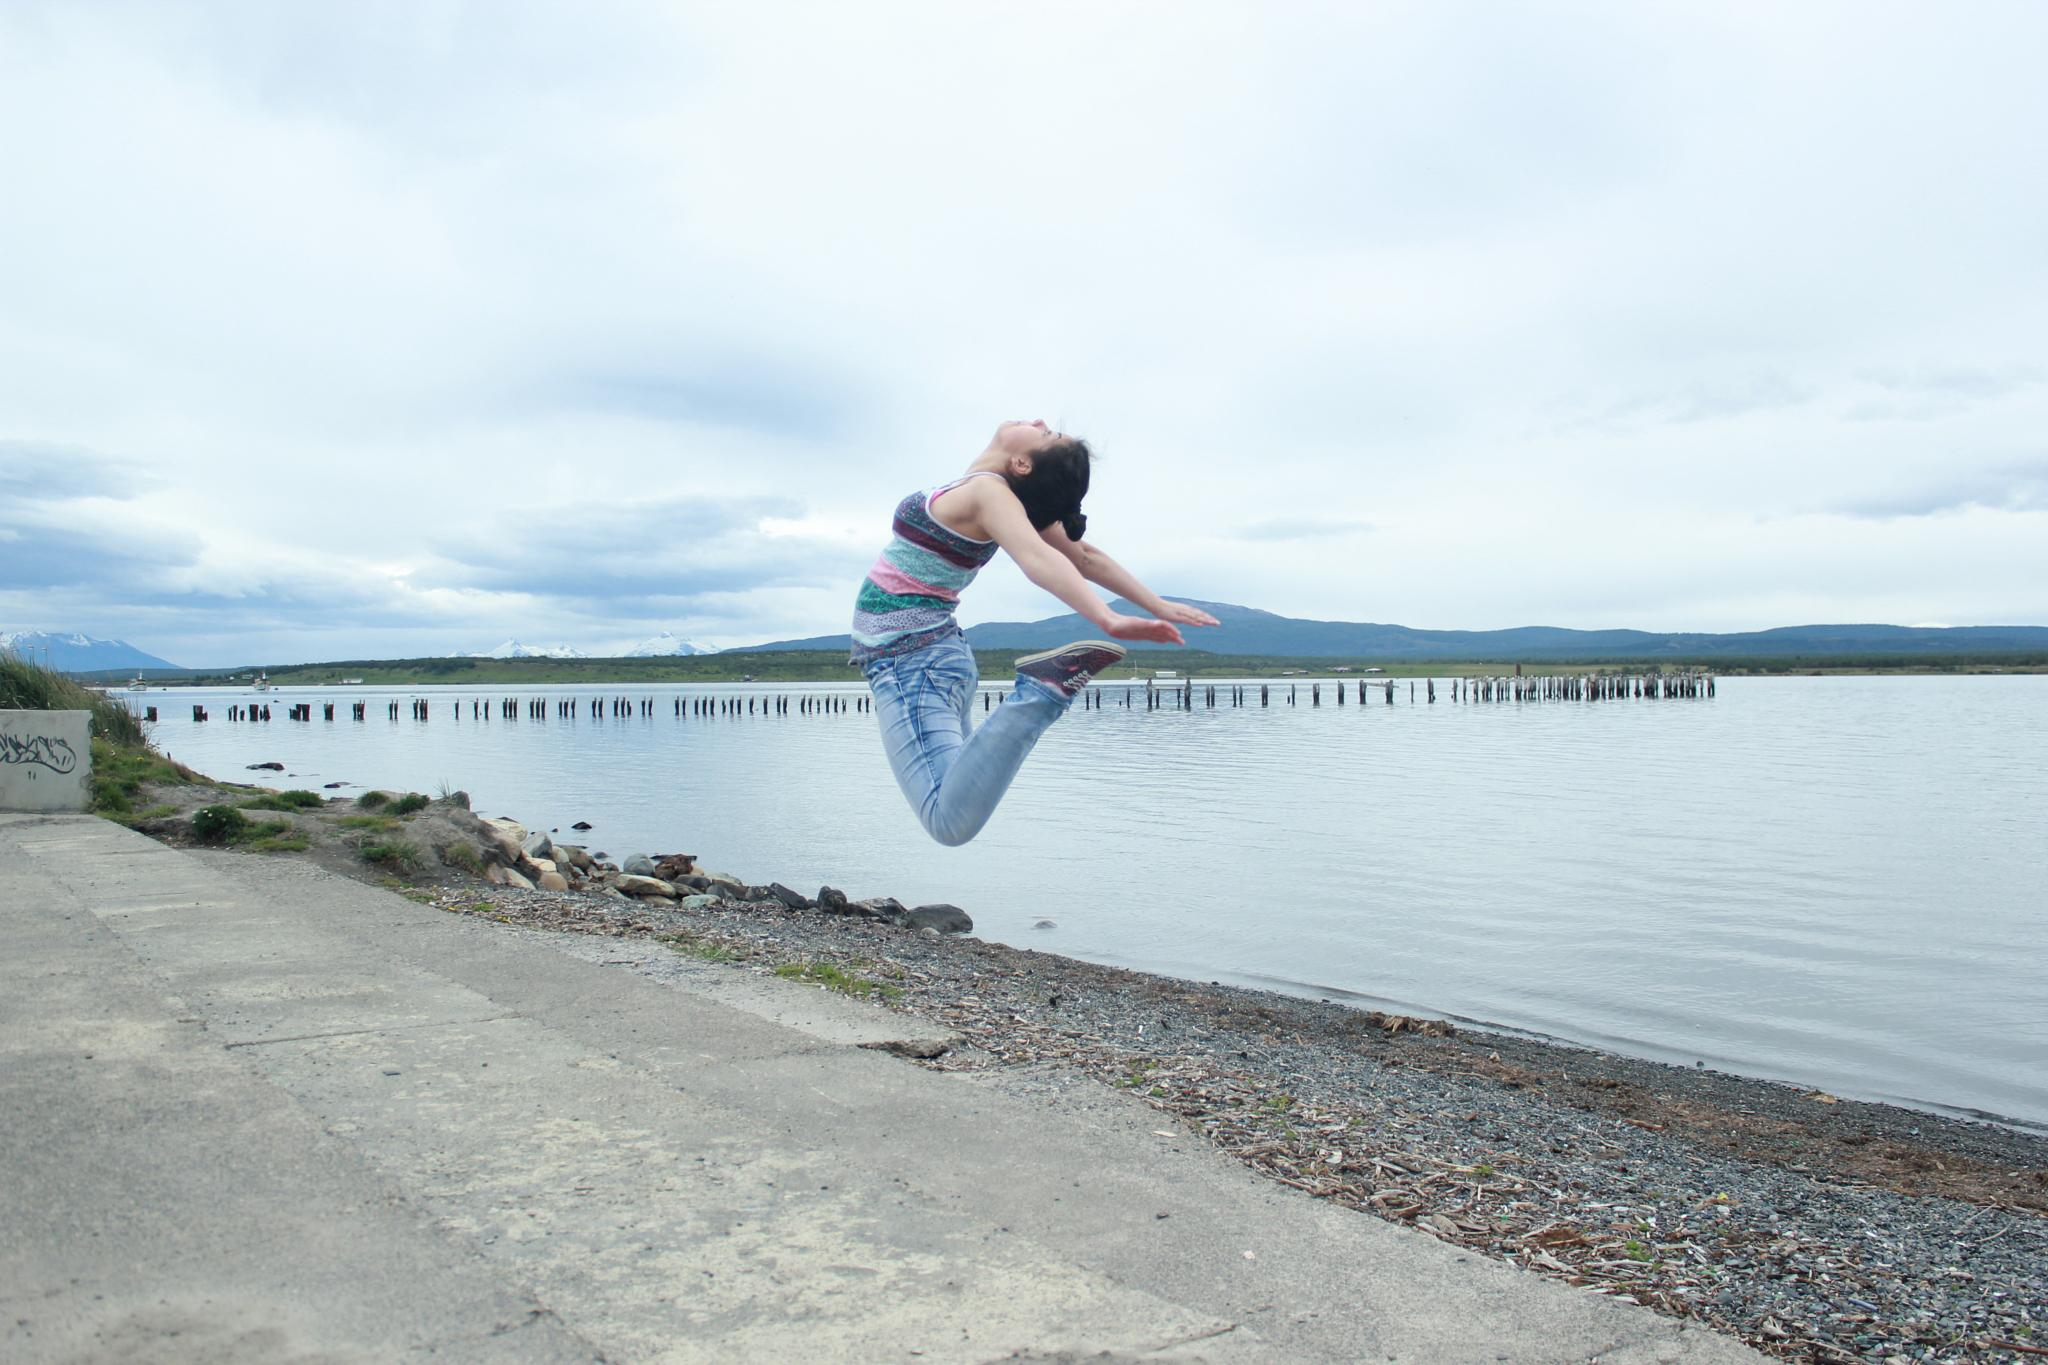 Jump by ckchamorro